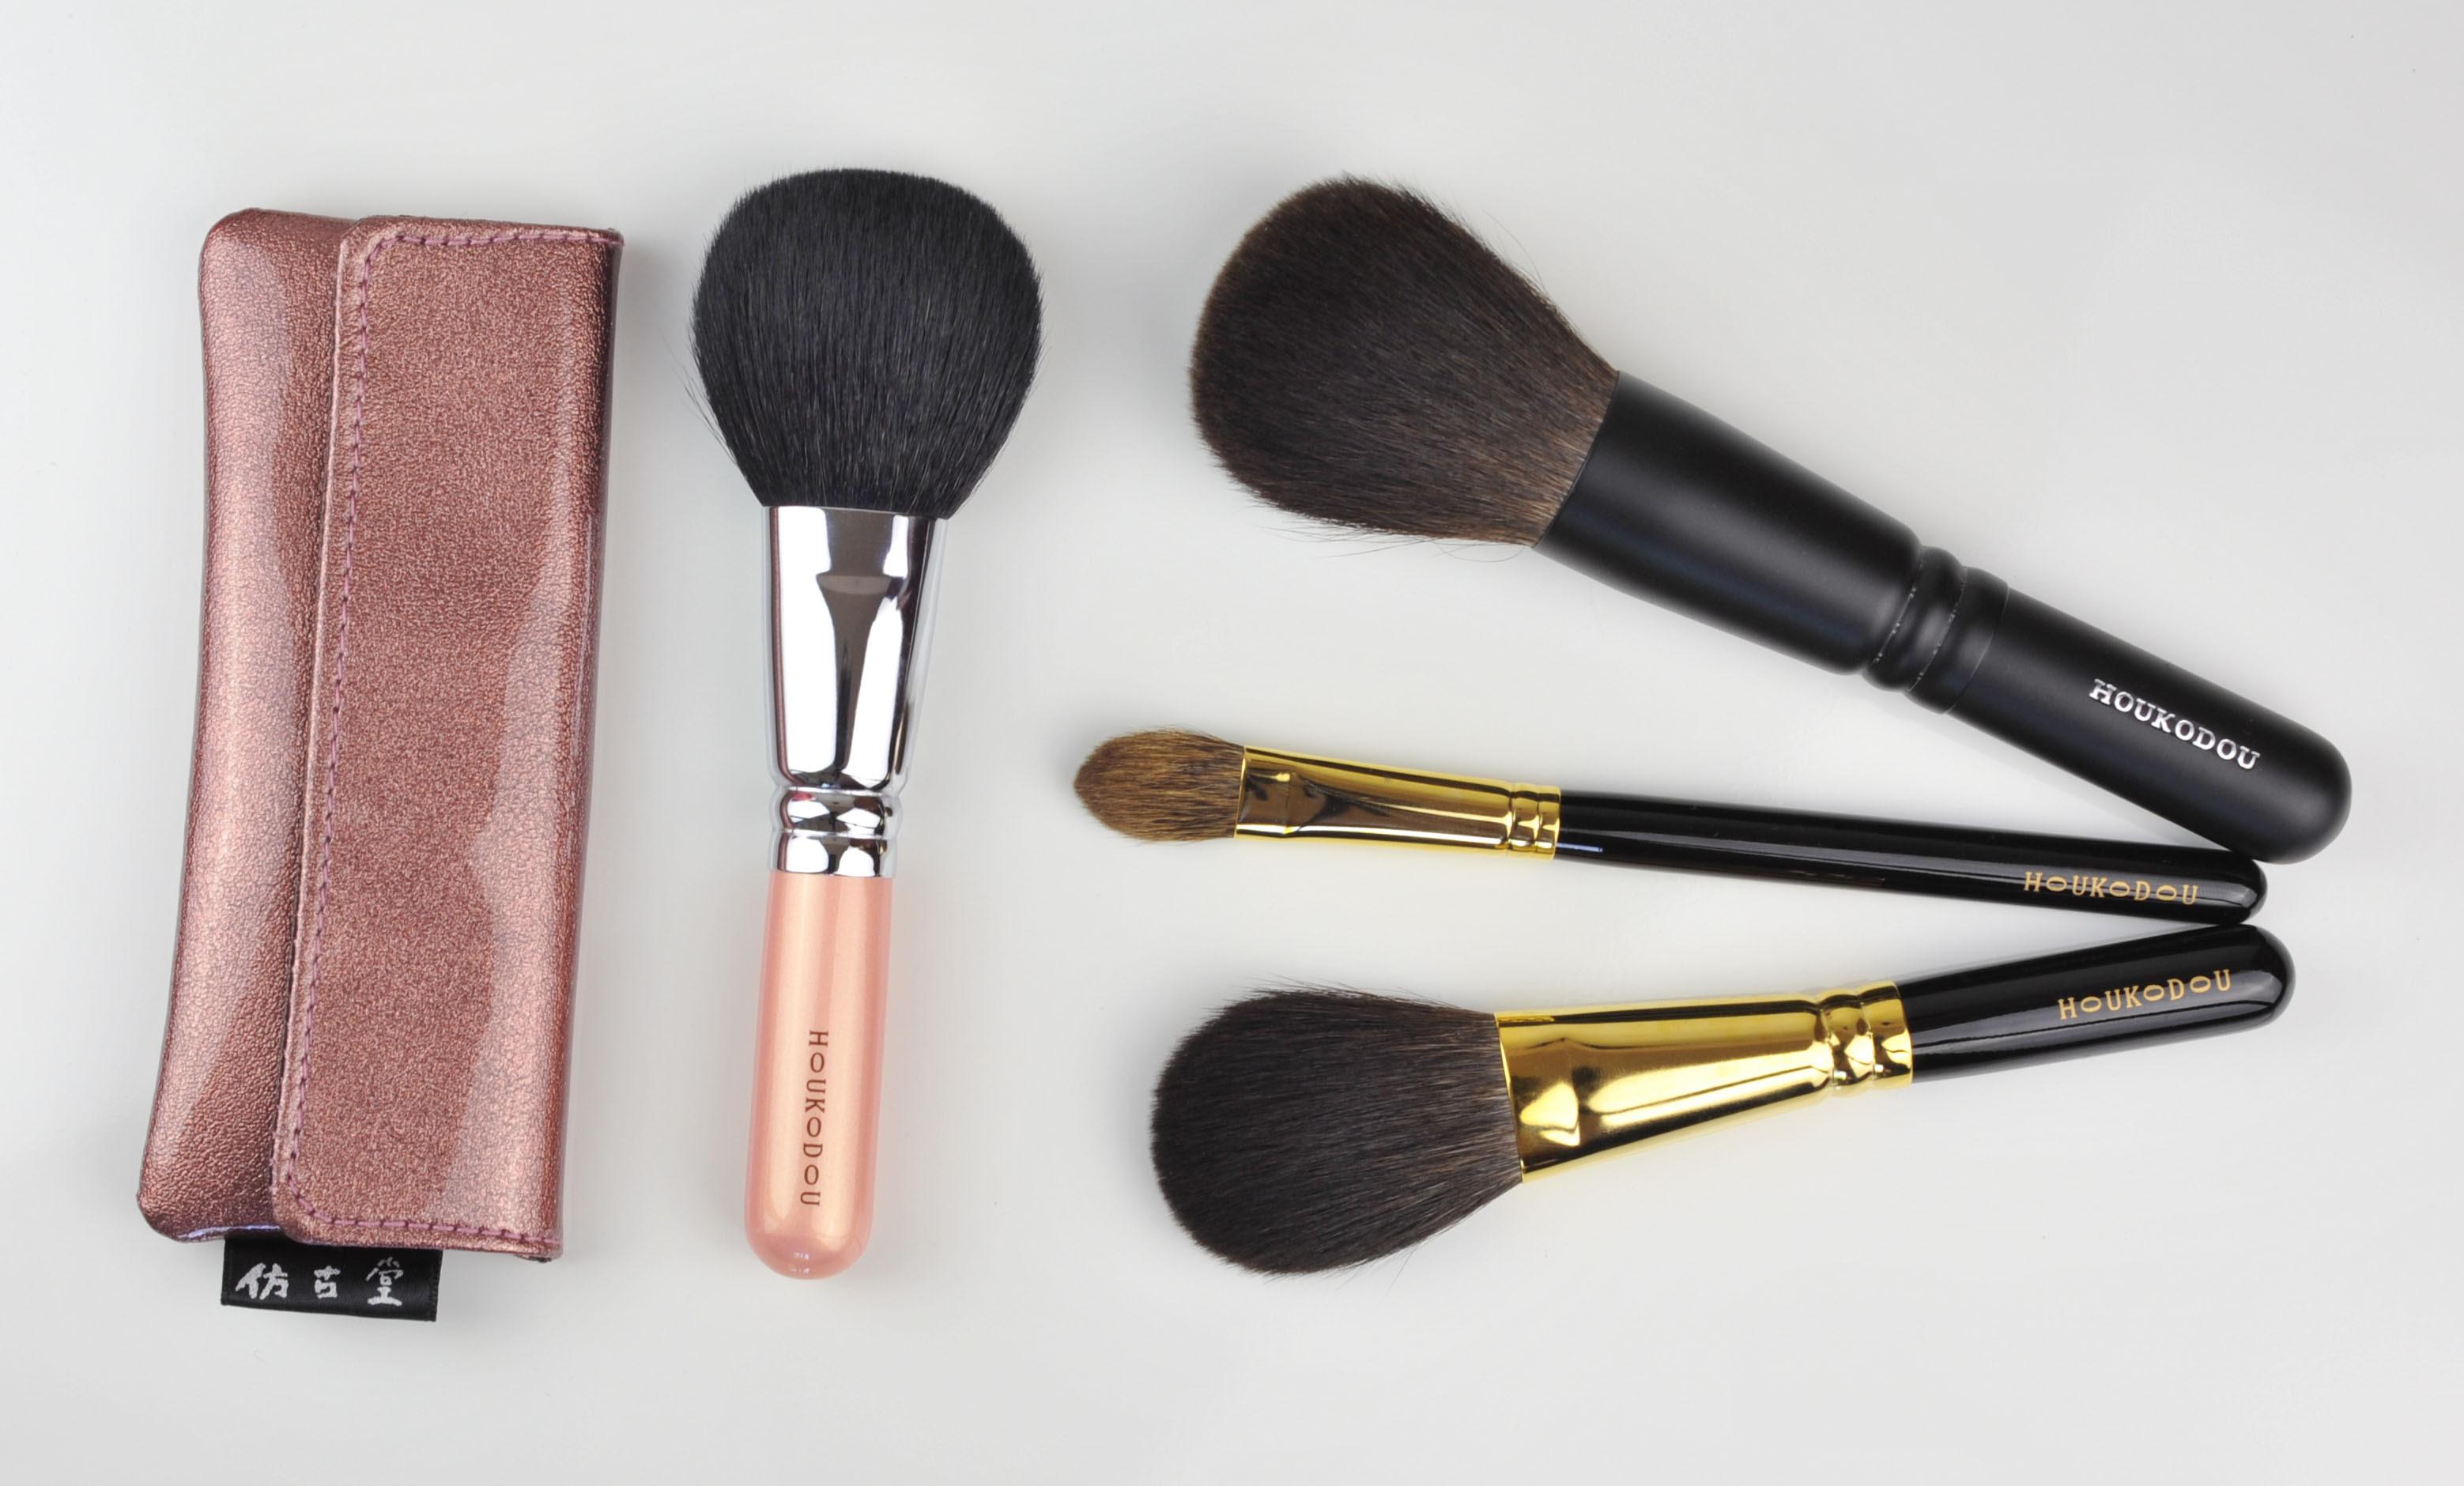 Japan brush haul 2014 - Sweet Makeup Temptations